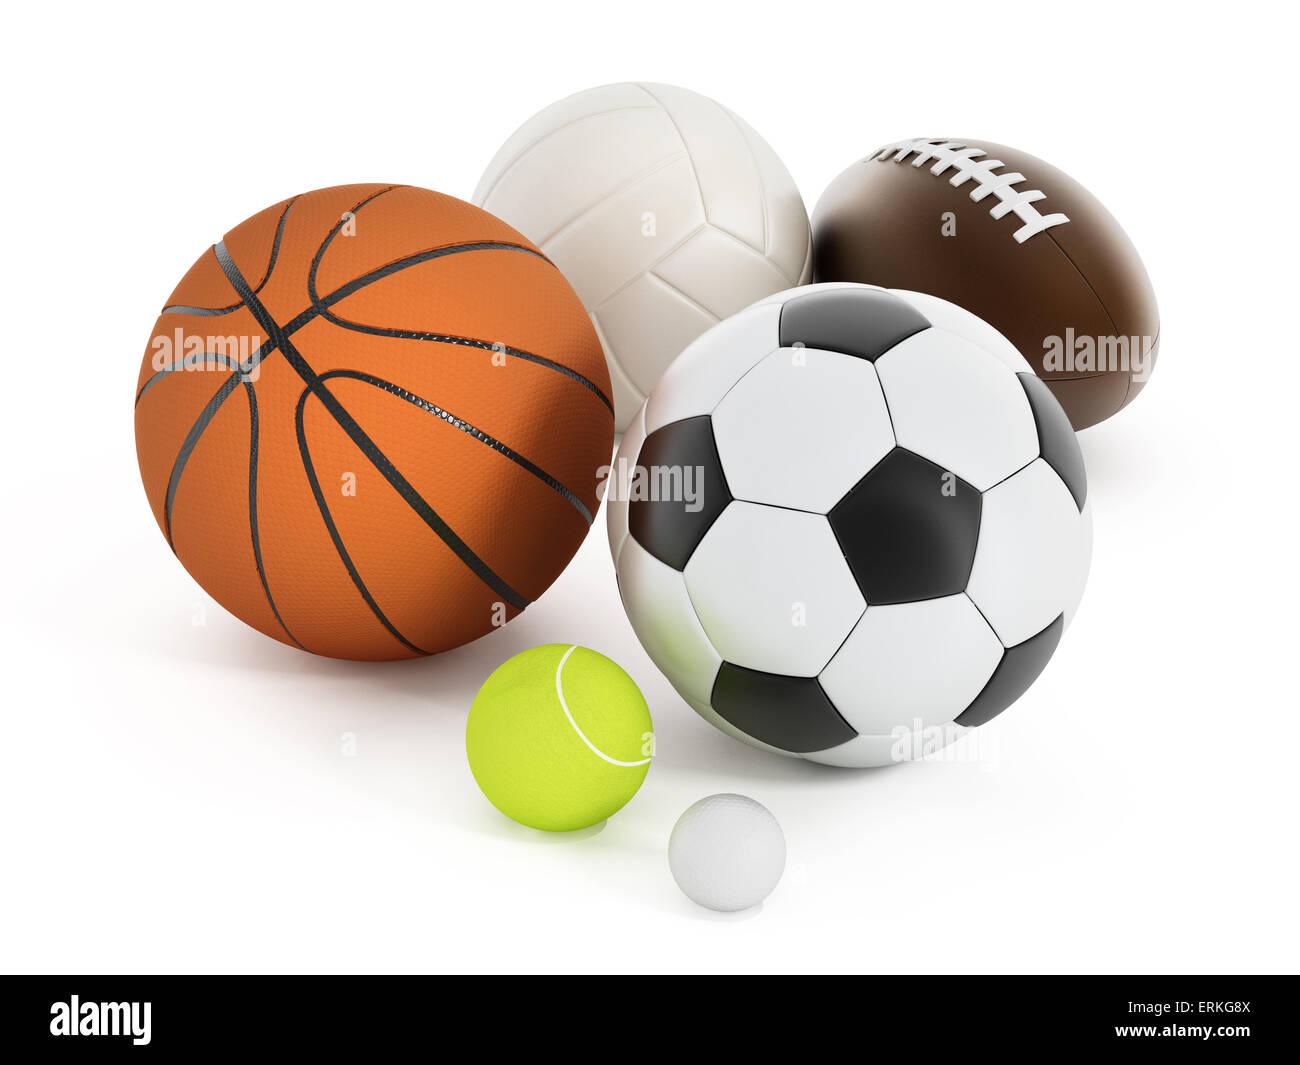 0f529ca77621d Fútbol